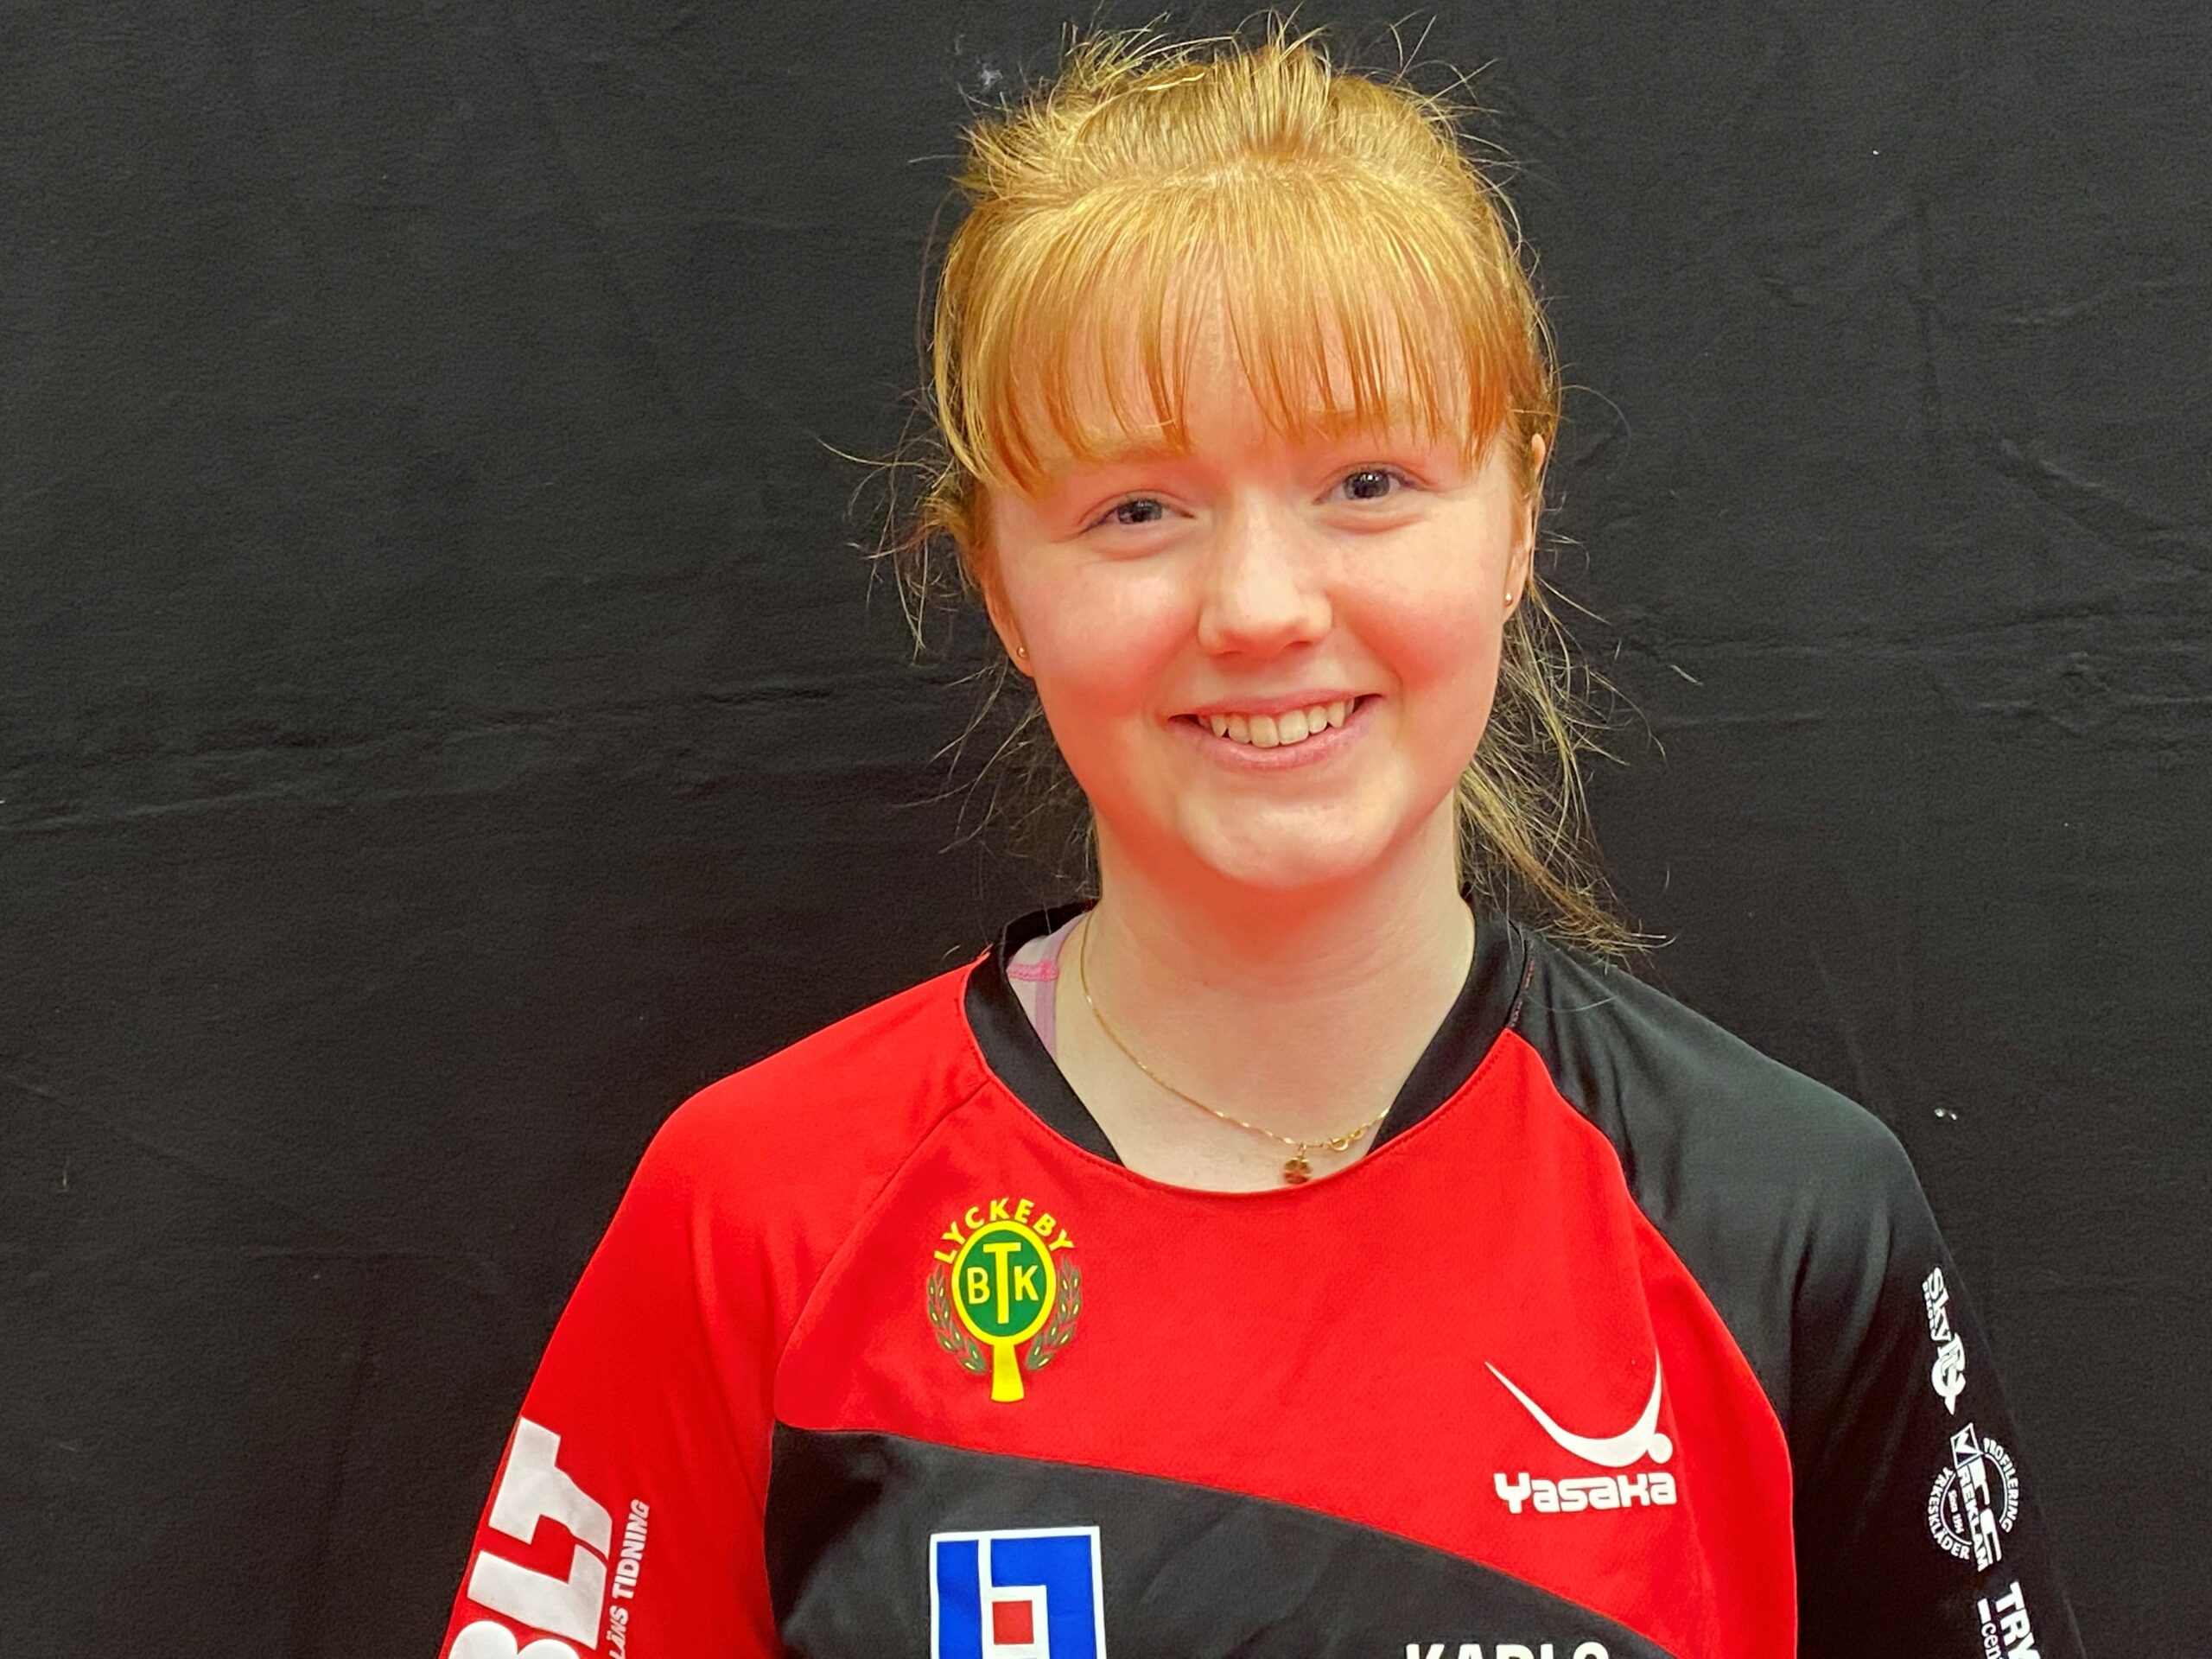 Hanna Kjellson